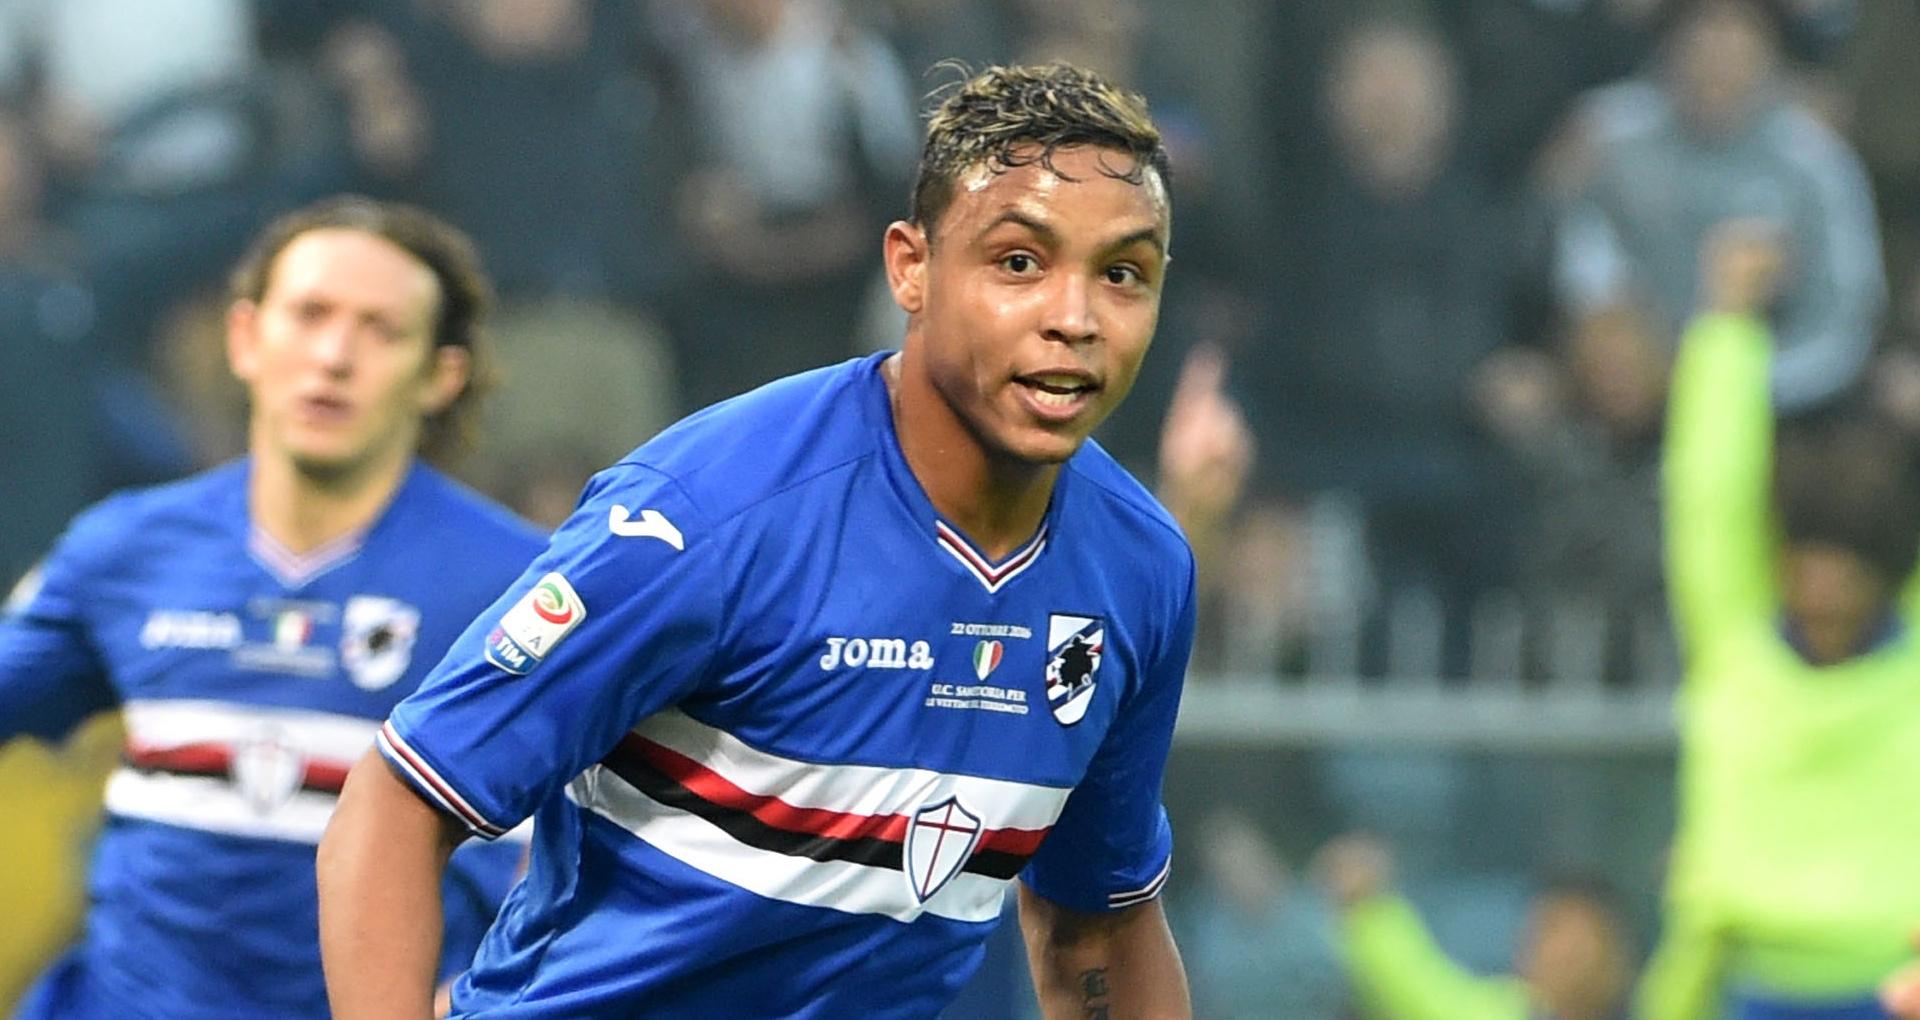 RUMOURS: Chelsea to make huge bid for Serie A striker Muriel